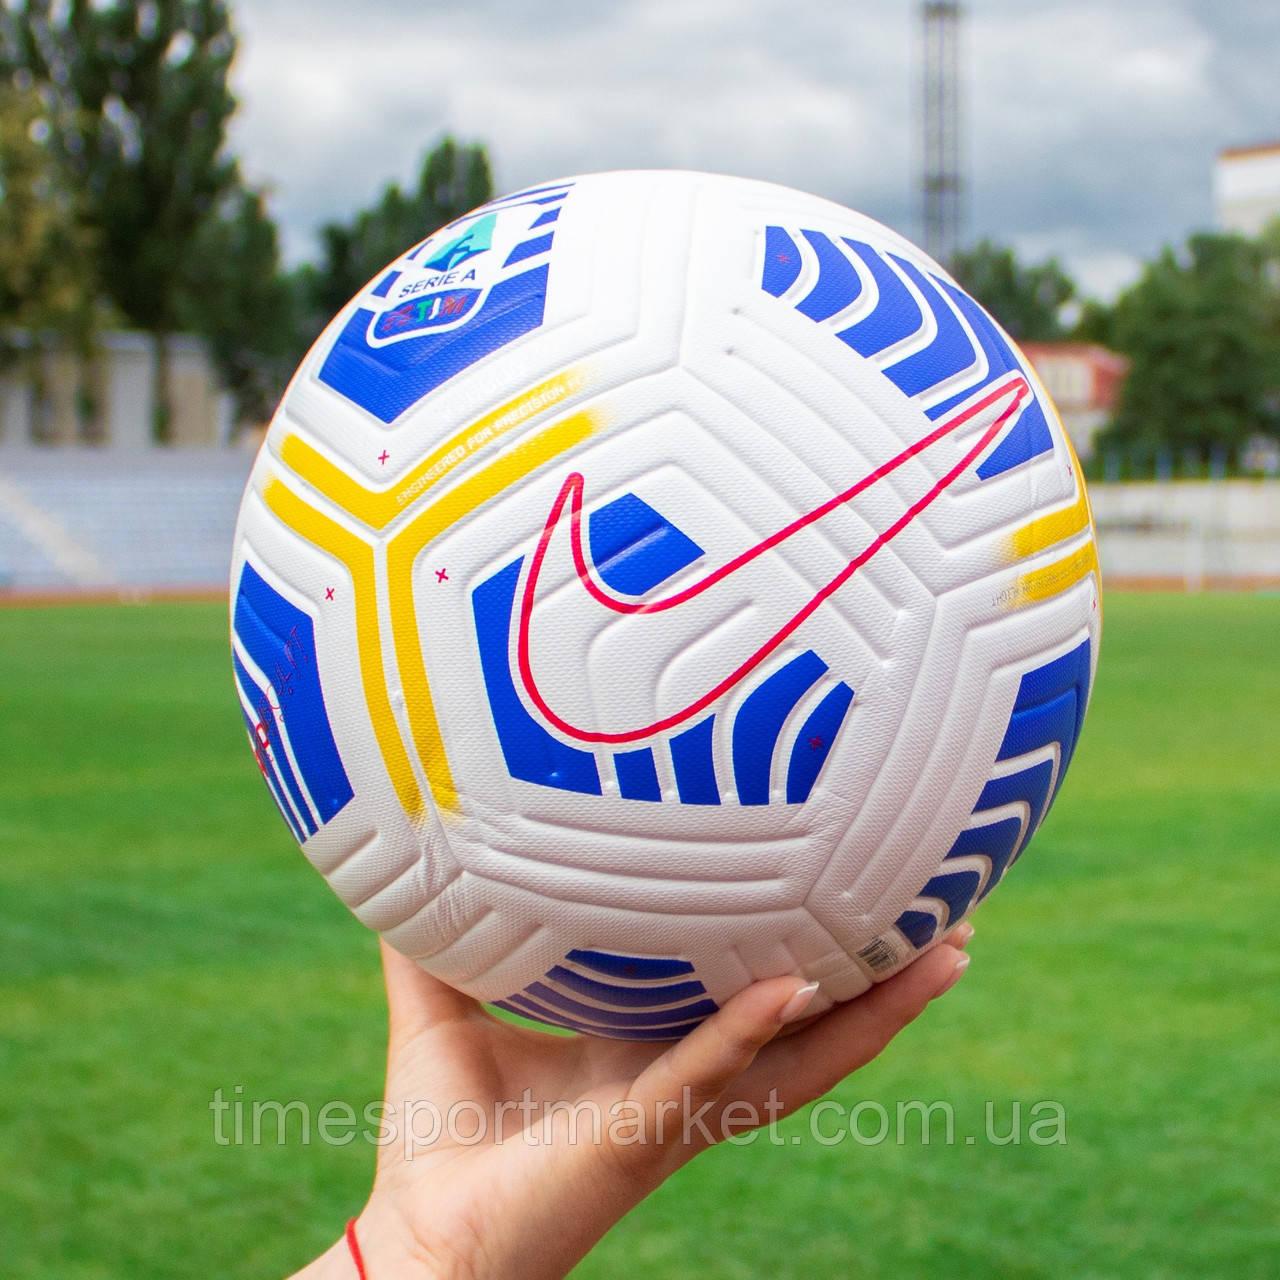 Футбольний м'яч Nike Strike AerowSculpt Seria A